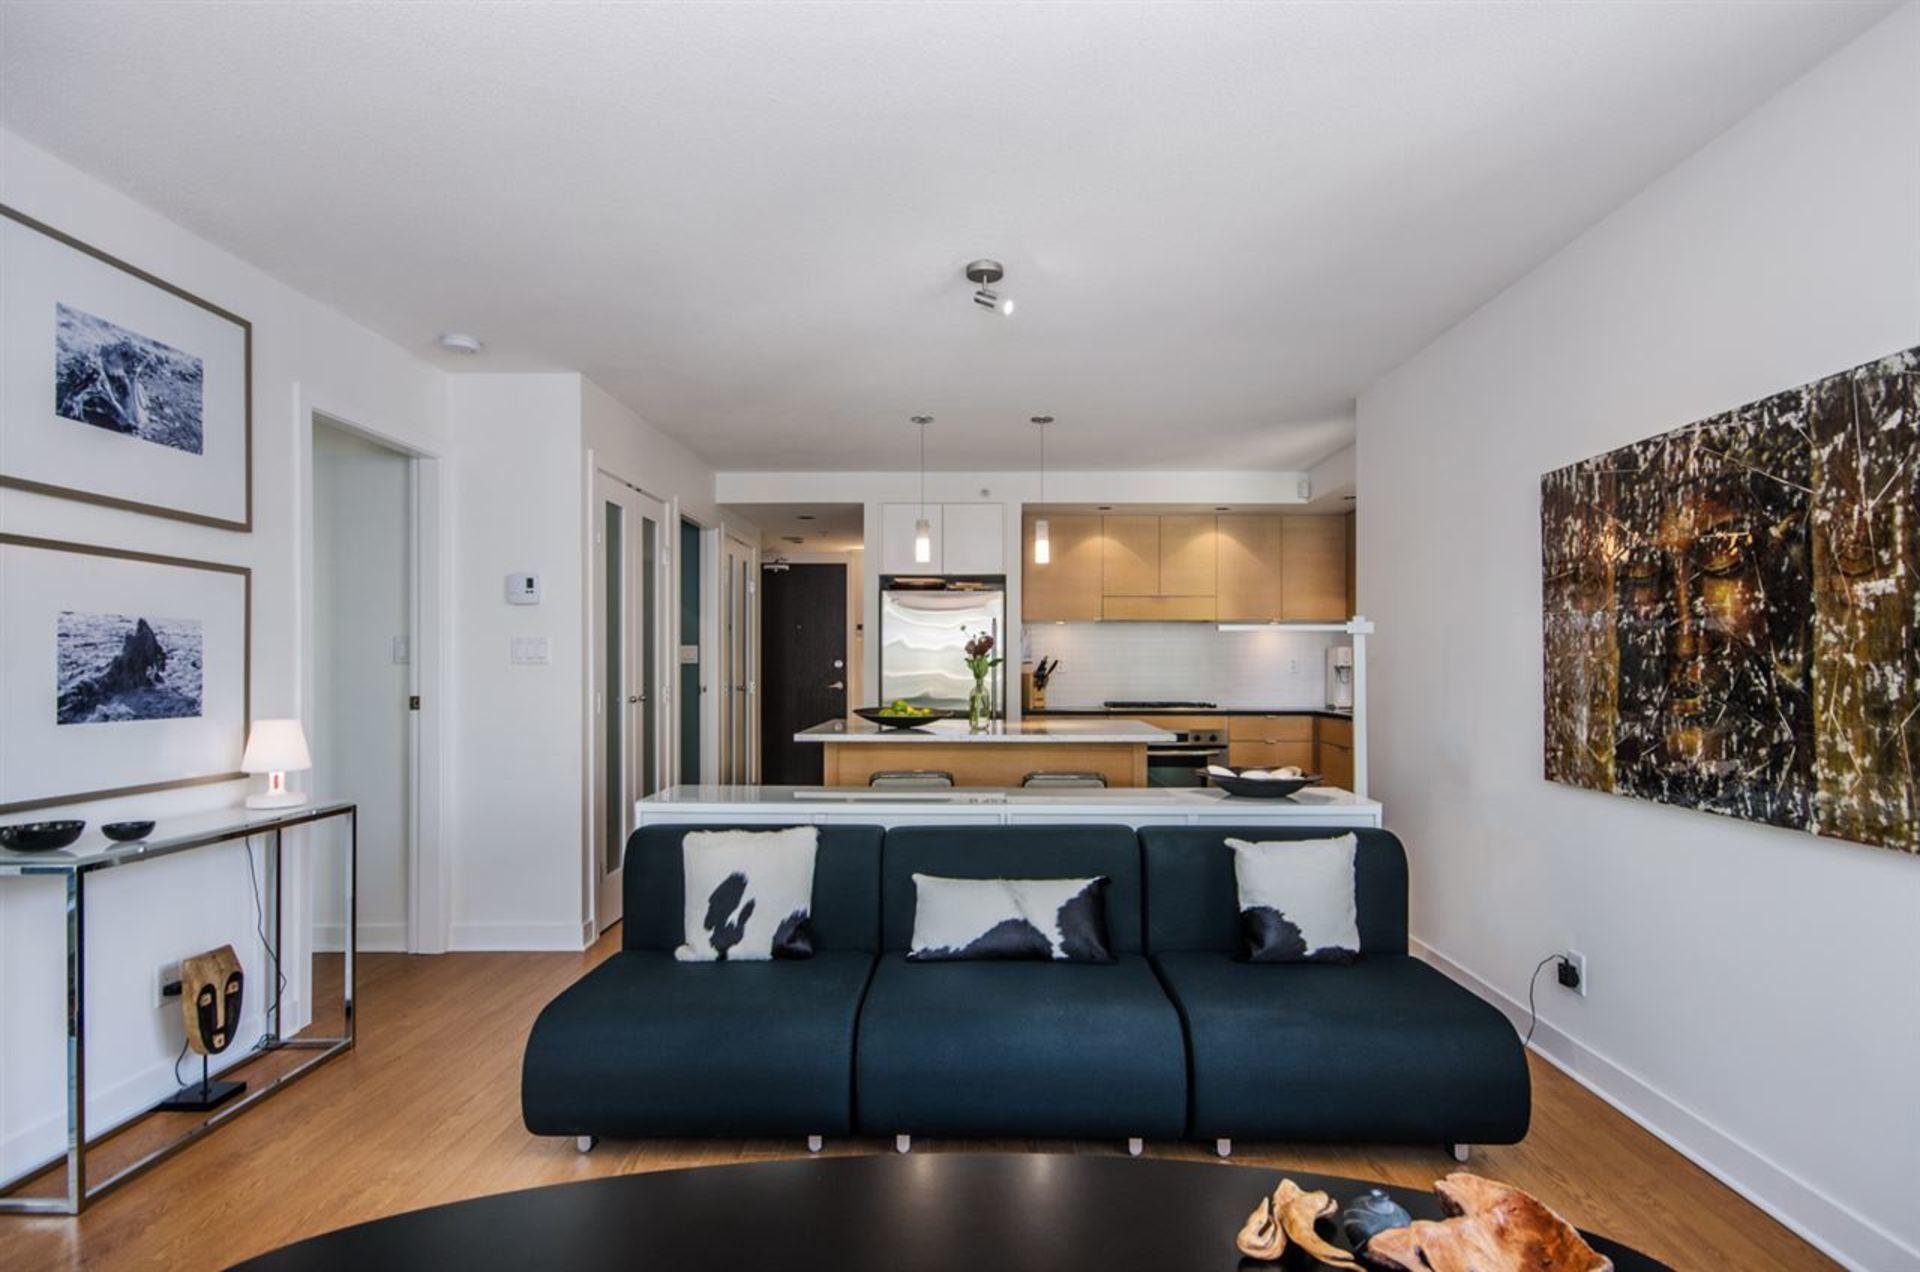 1055-homer-street-yaletown-vancouver-west-08 at 1101 - 1055 Homer Street, Yaletown, Vancouver West